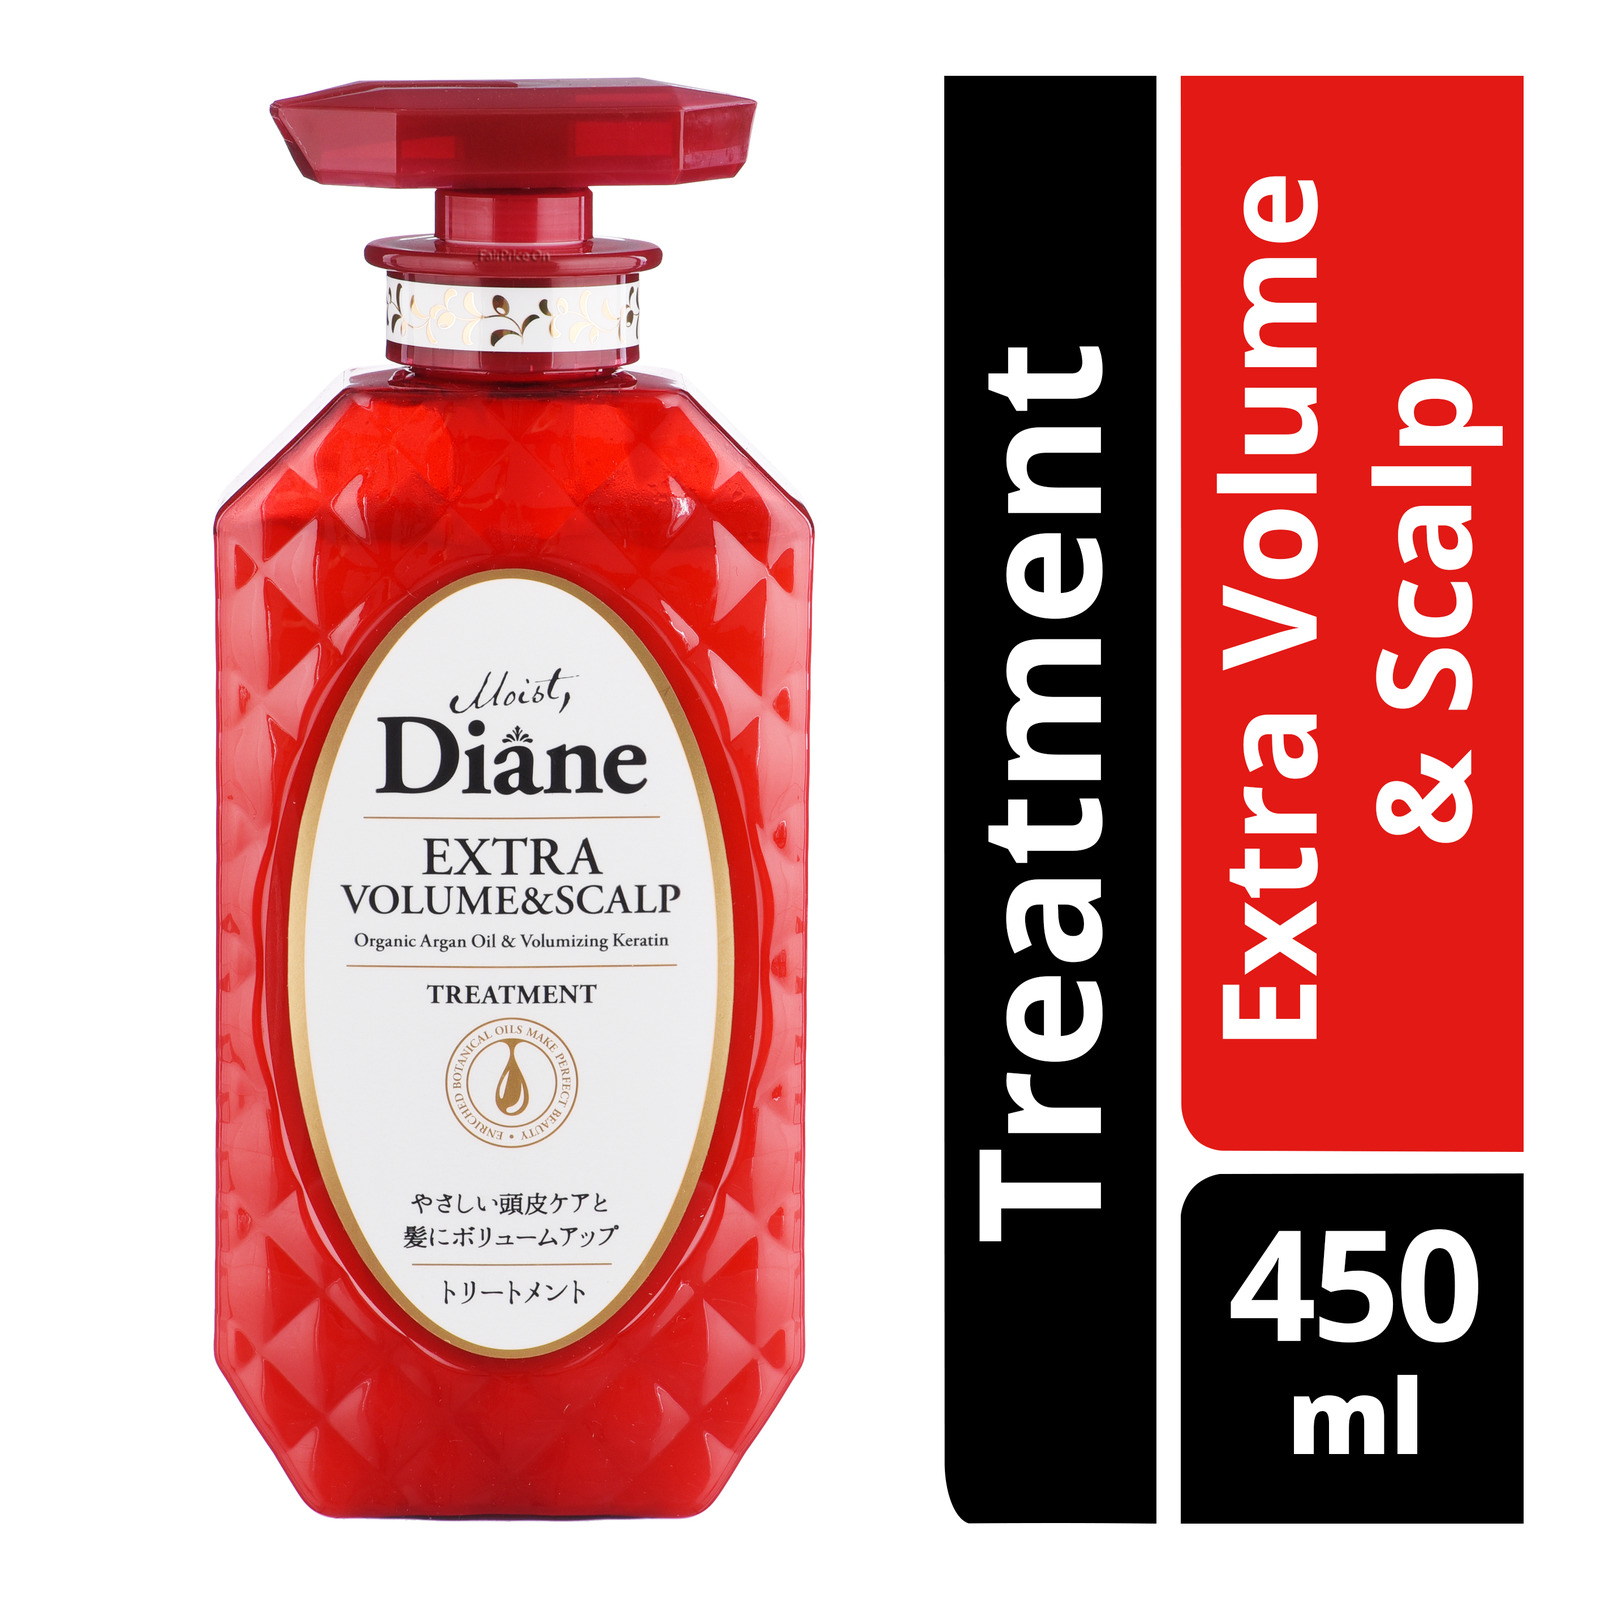 Moist Diane Treatment - Extra Volume & Scalp